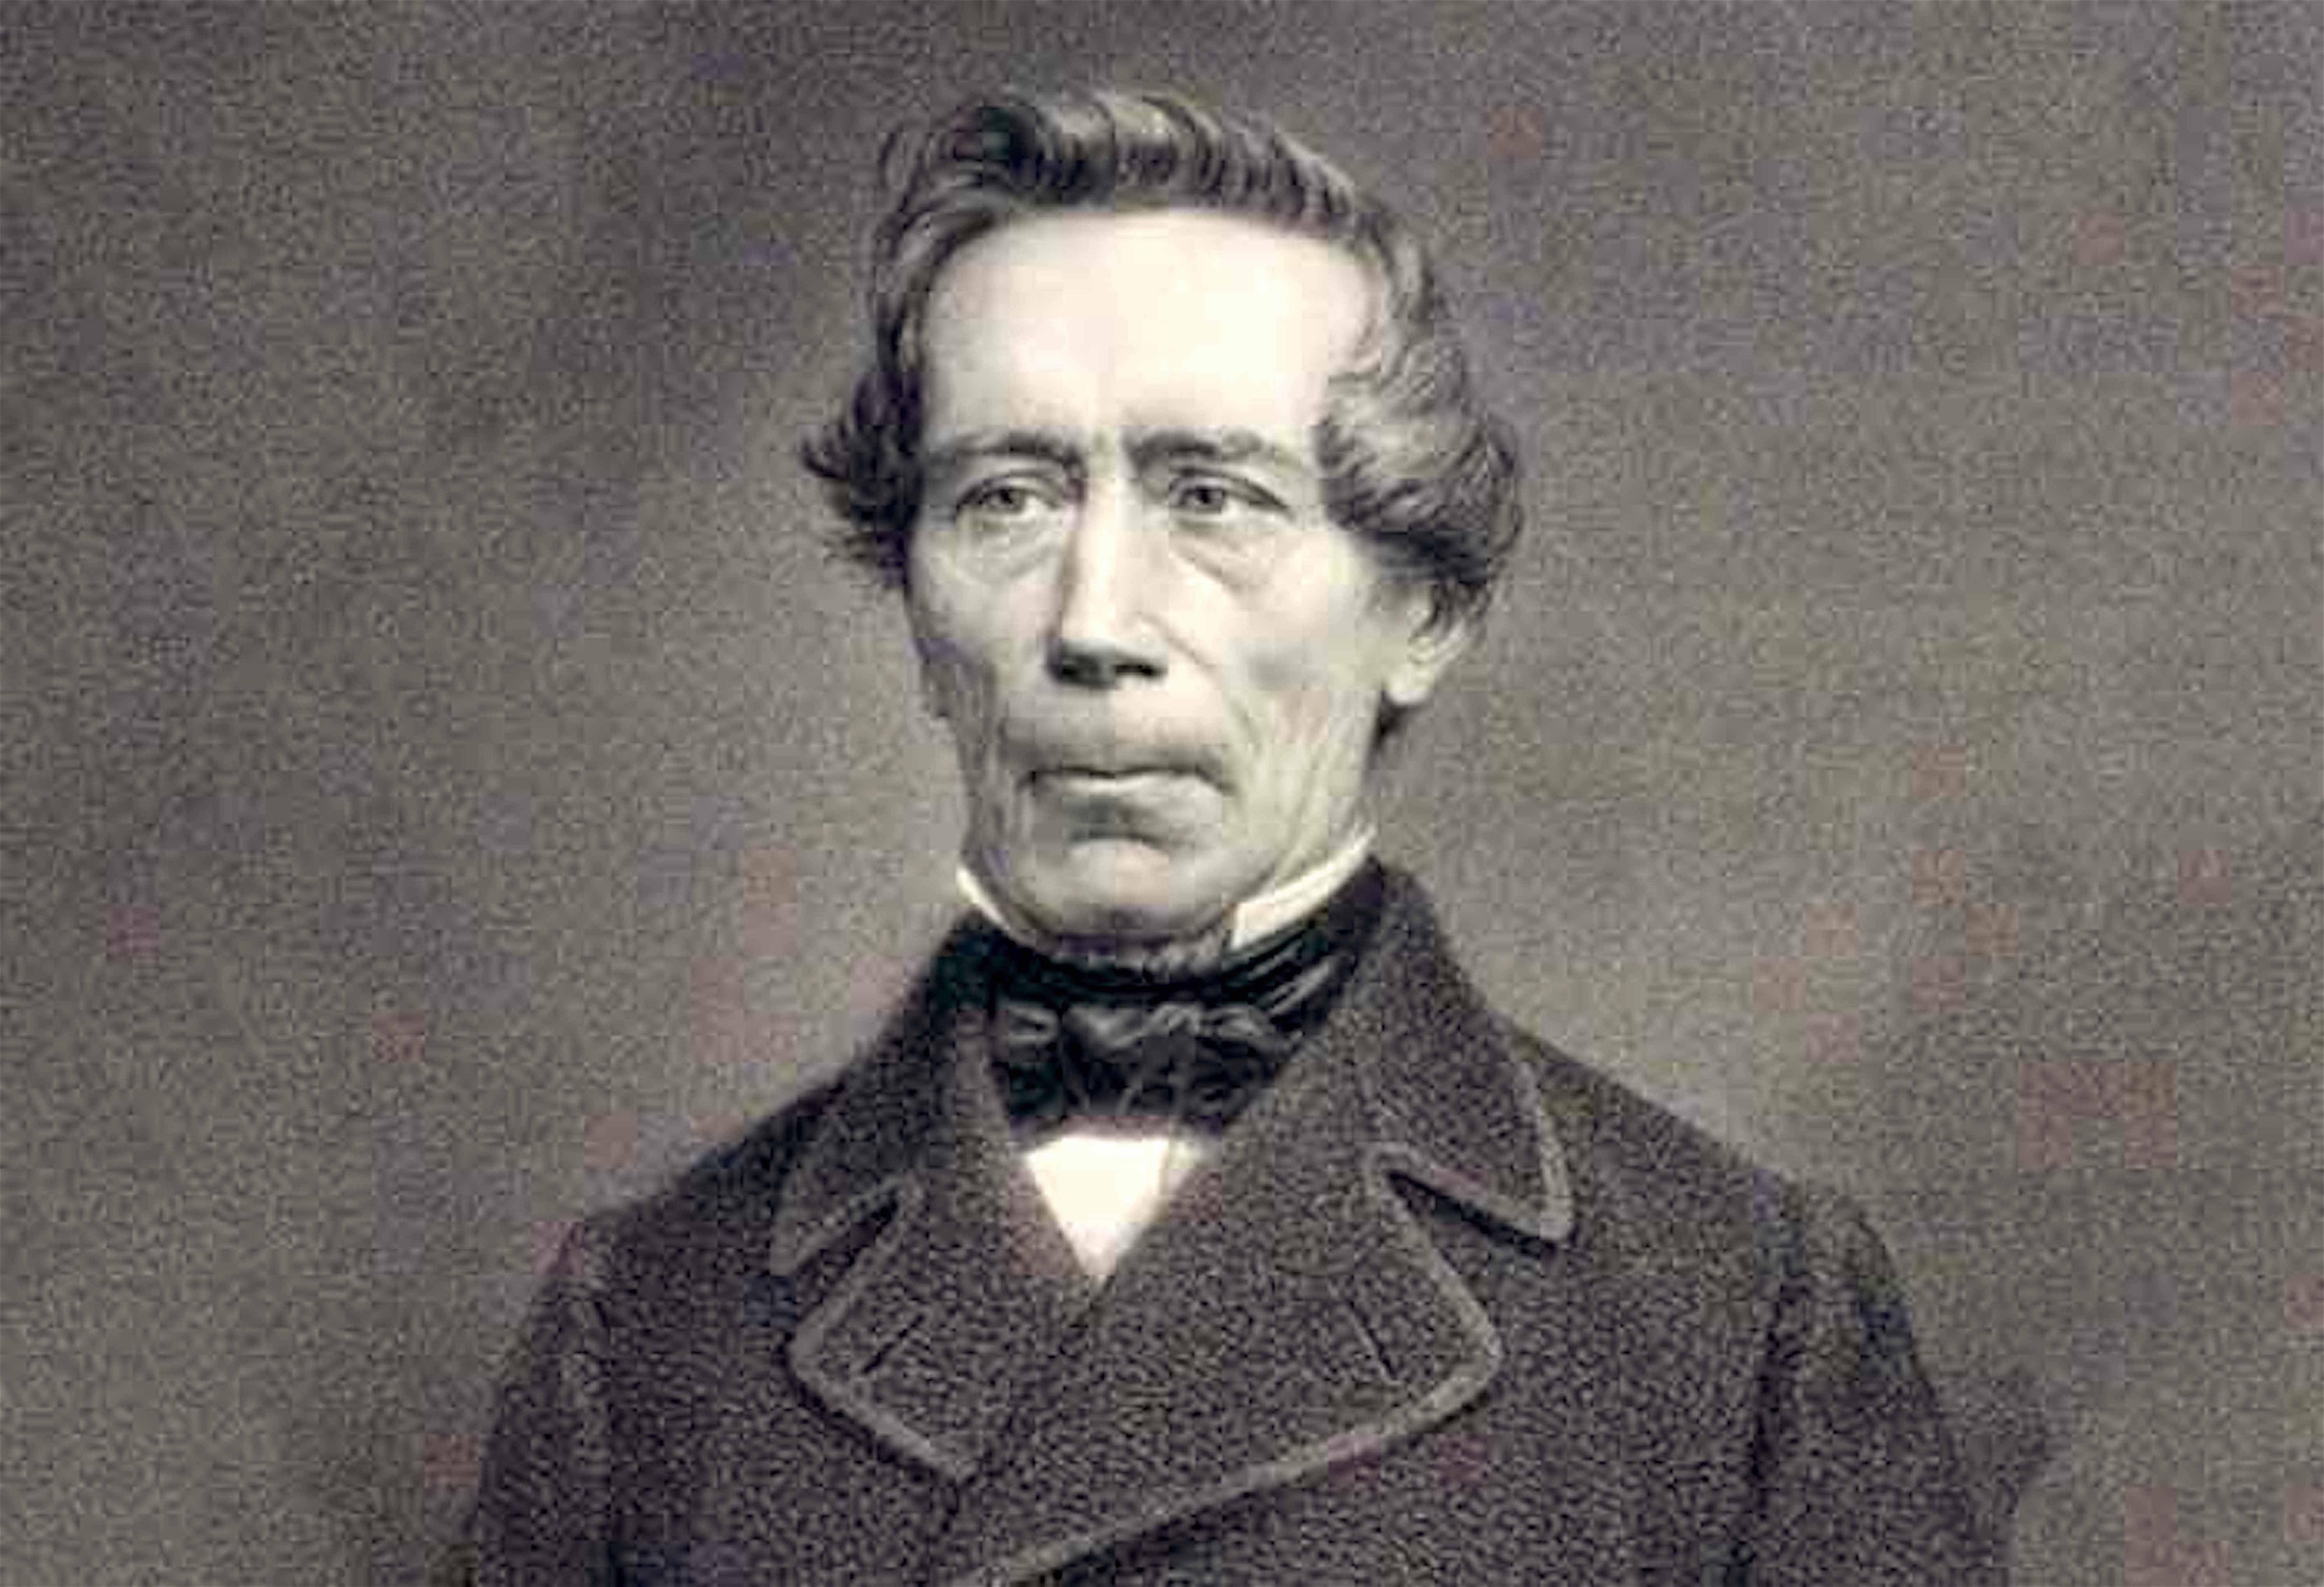 Johan Rudolph Thorbecke (1798-1872)